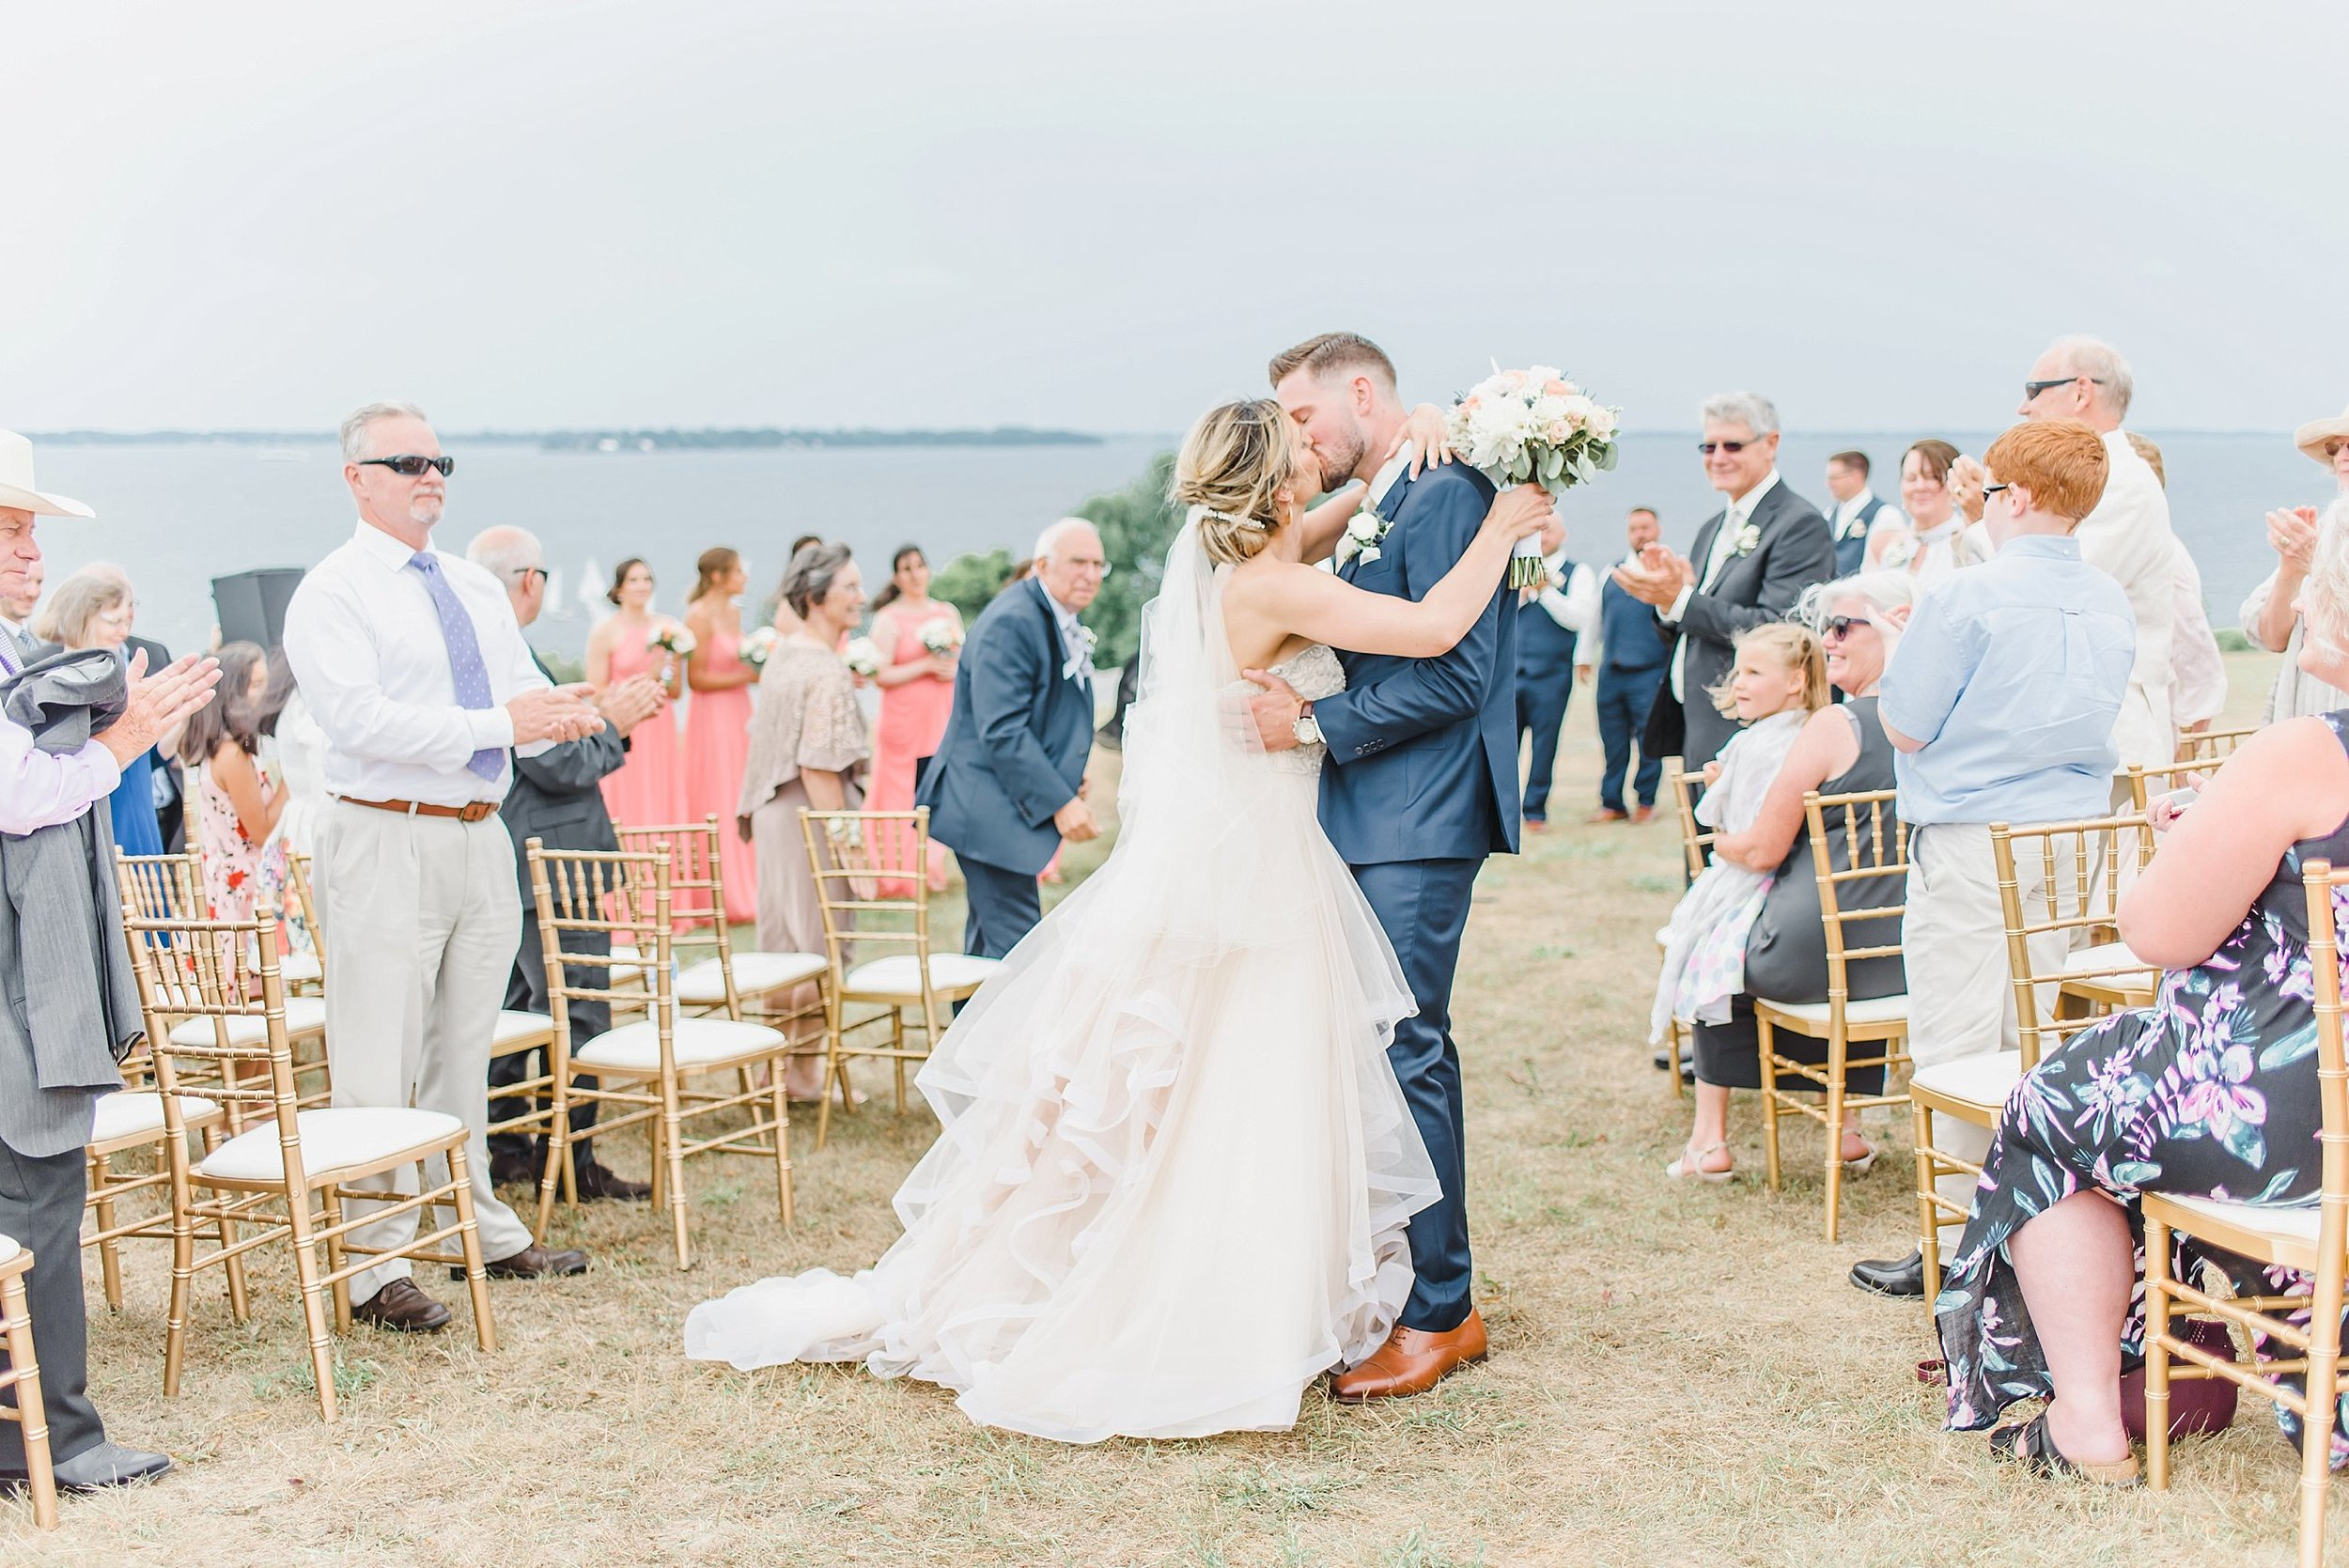 light airy indie fine art ottawa wedding photographer | Ali and Batoul Photography_0193.jpg